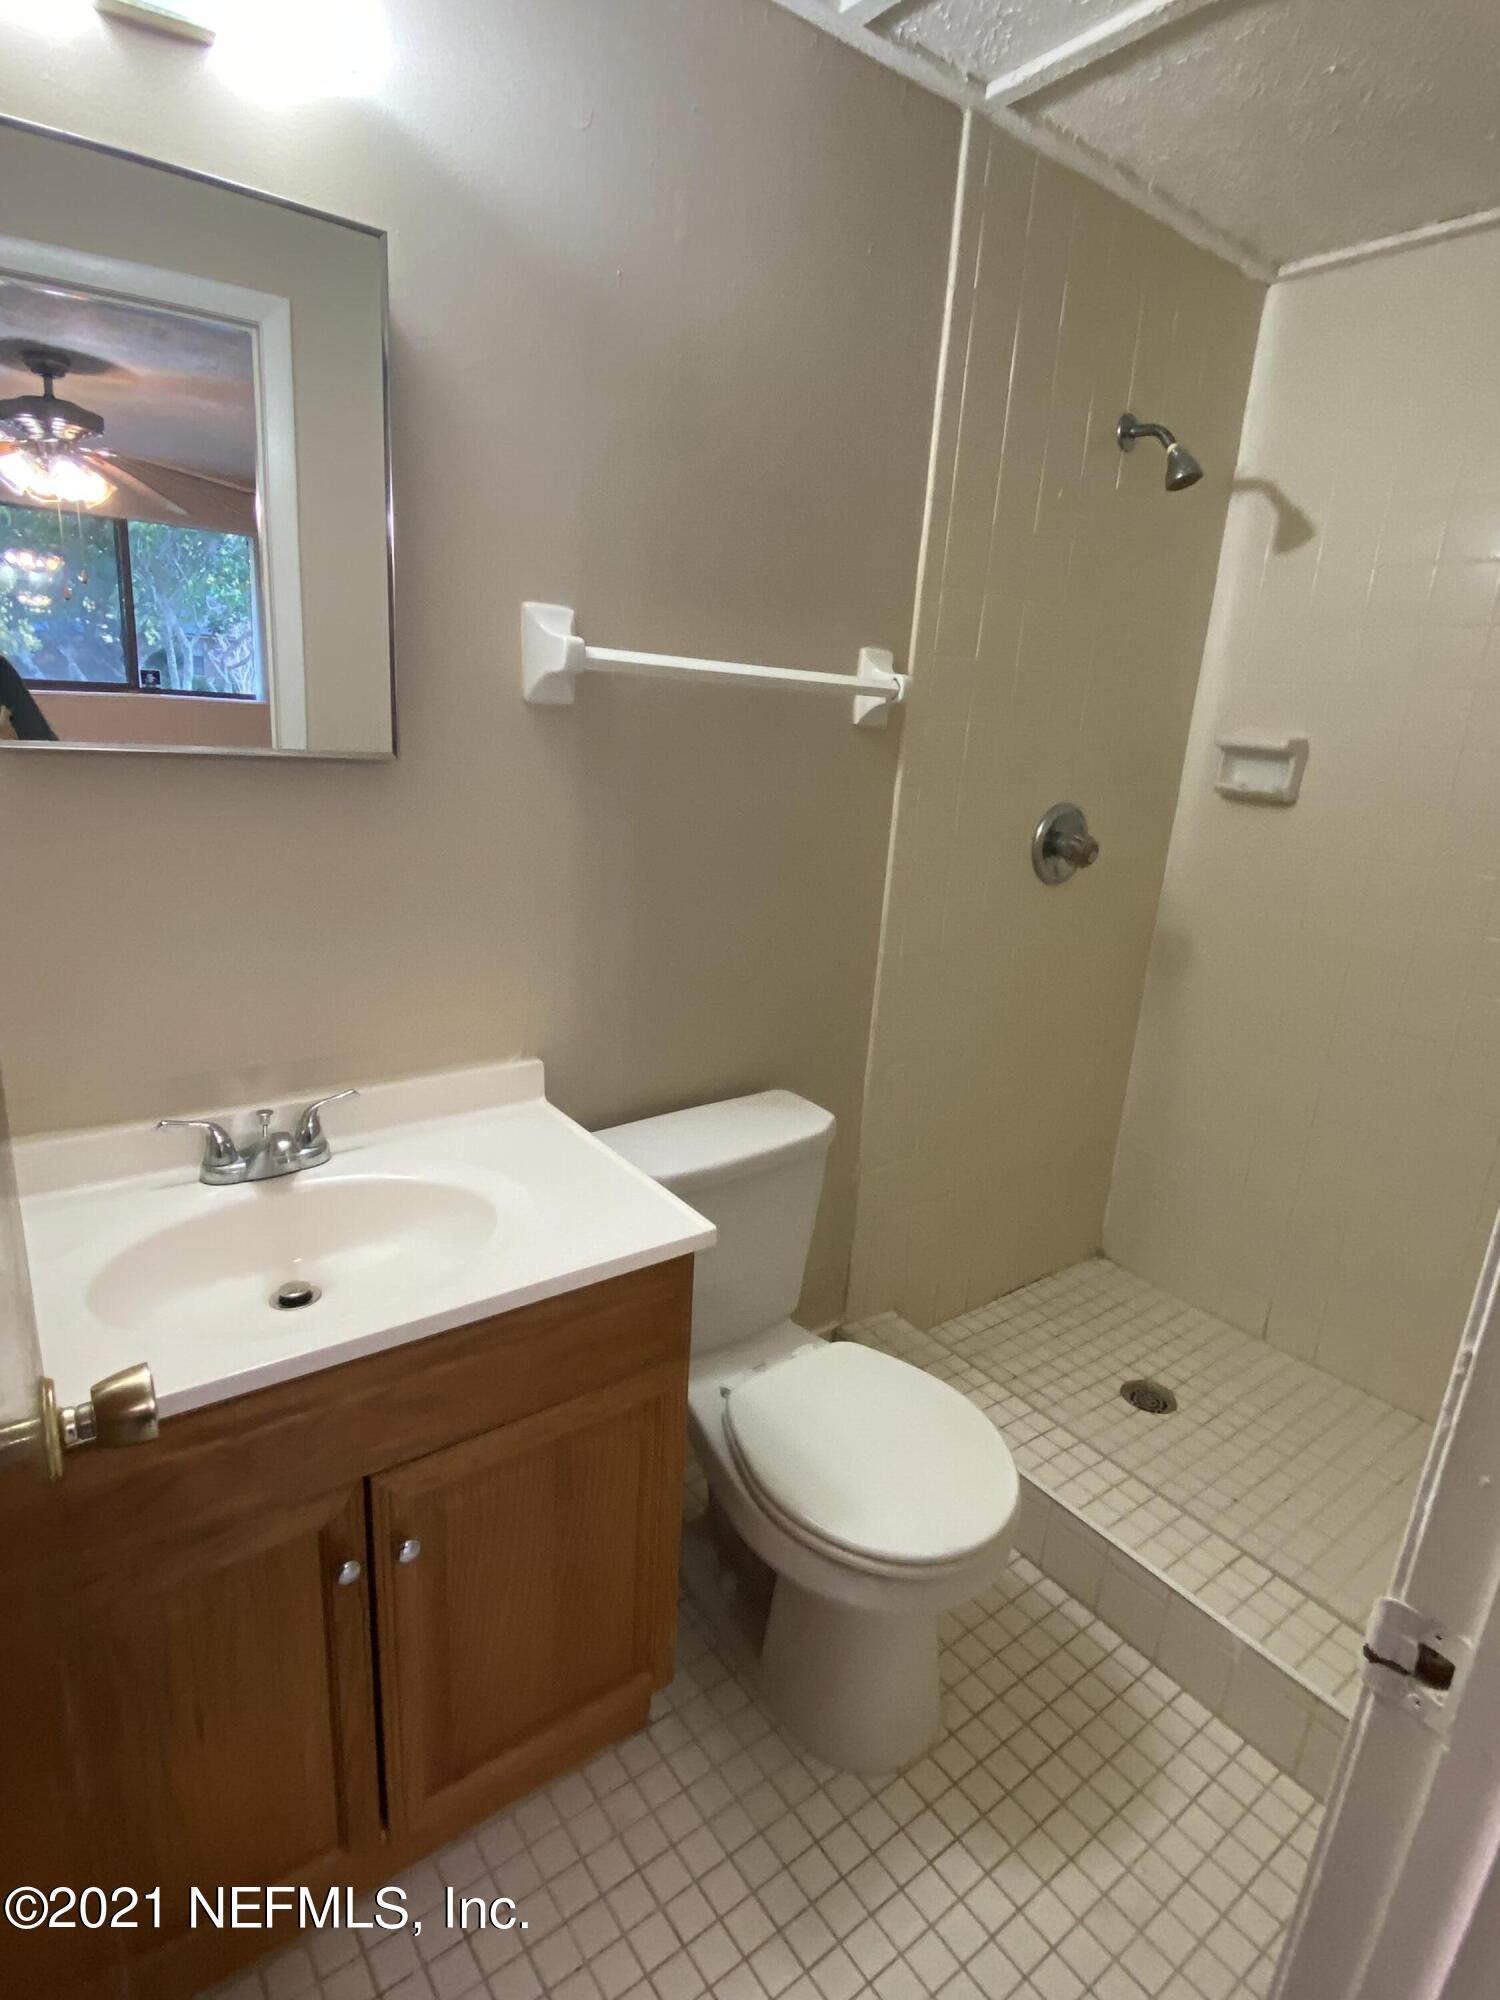 2344 CONSTITUTION, ORANGE PARK, FLORIDA 32073, 3 Bedrooms Bedrooms, ,2 BathroomsBathrooms,Residential,For sale,CONSTITUTION,1135931